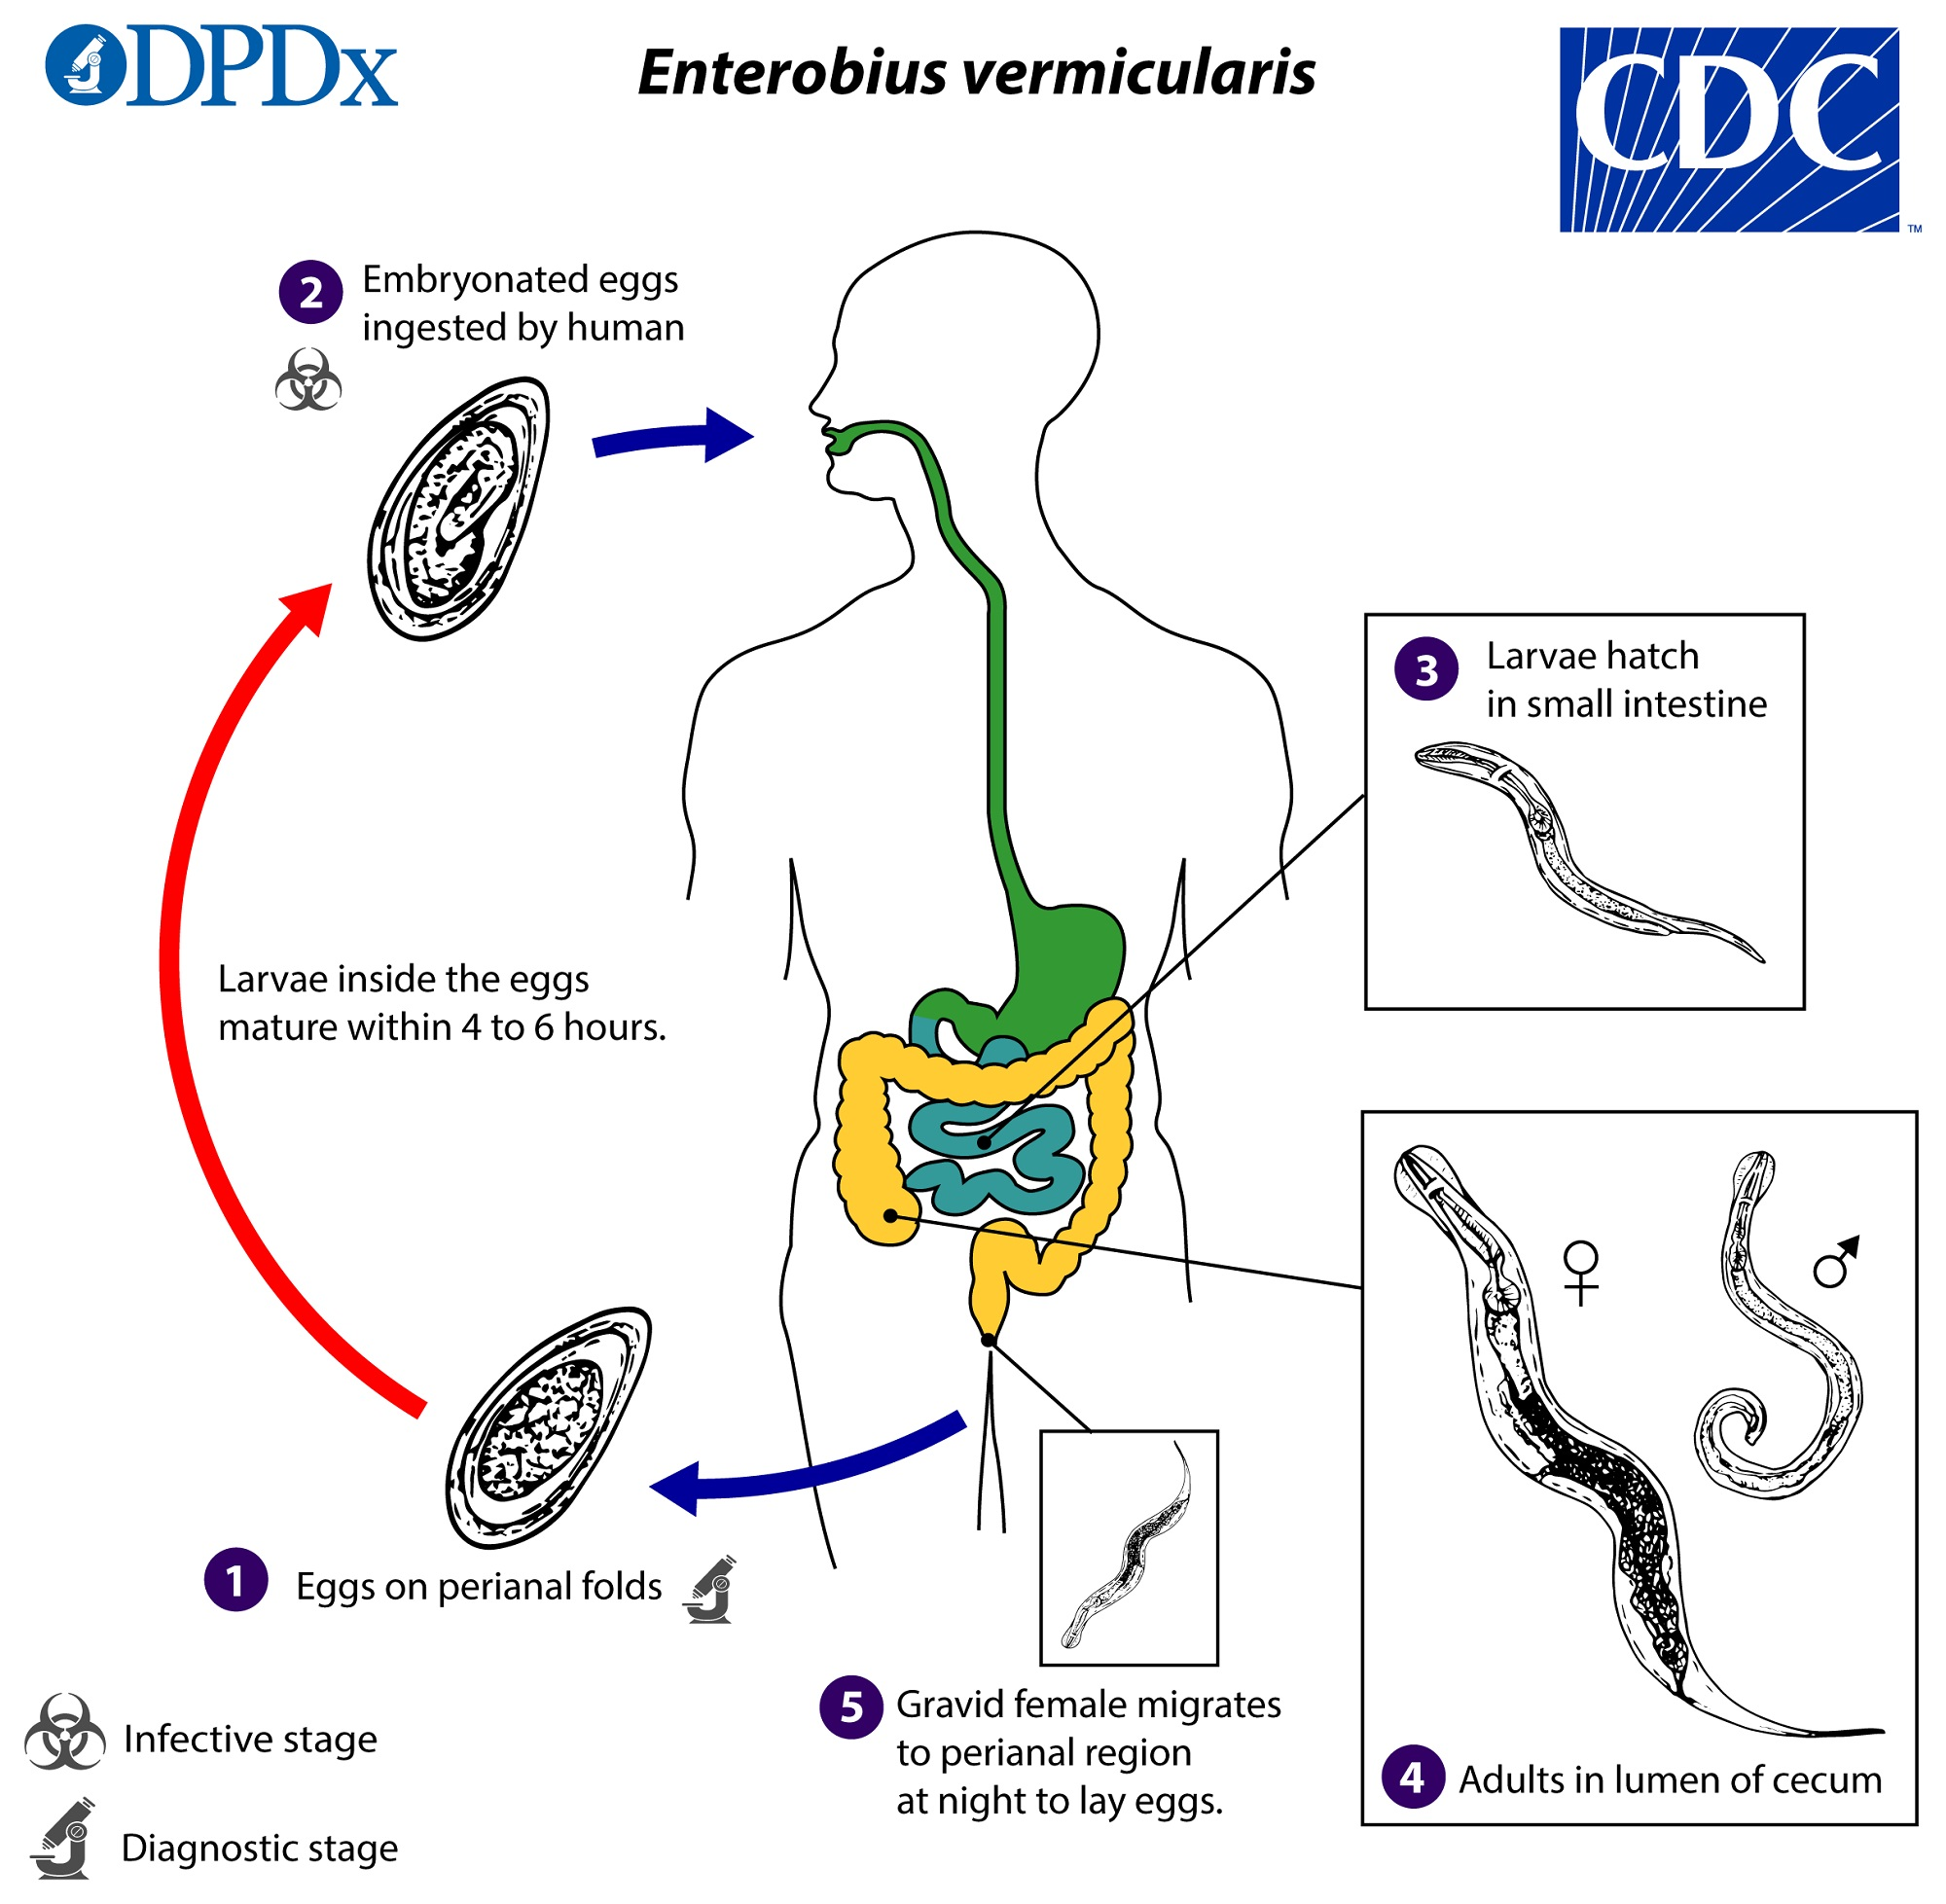 Enterobiosis vermicularis